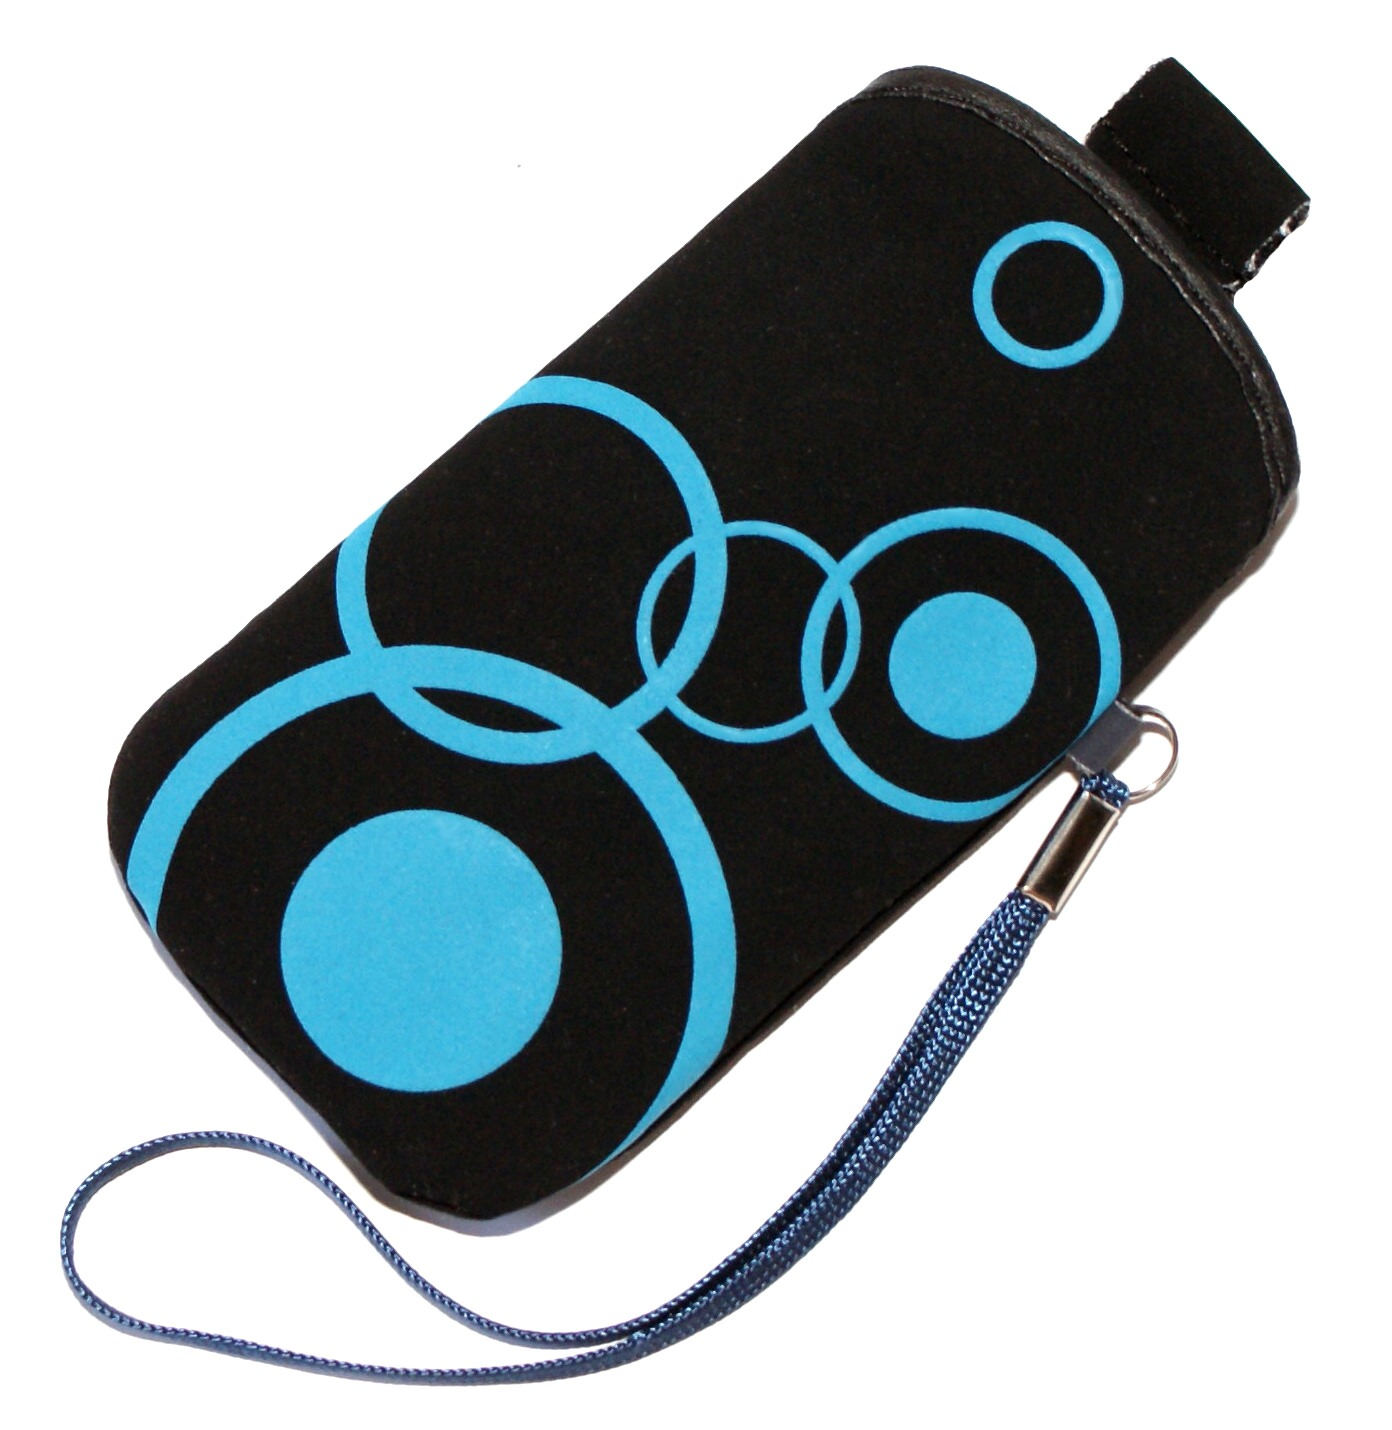 Ochranné pouzdro na mobilní telefon Nokia N73